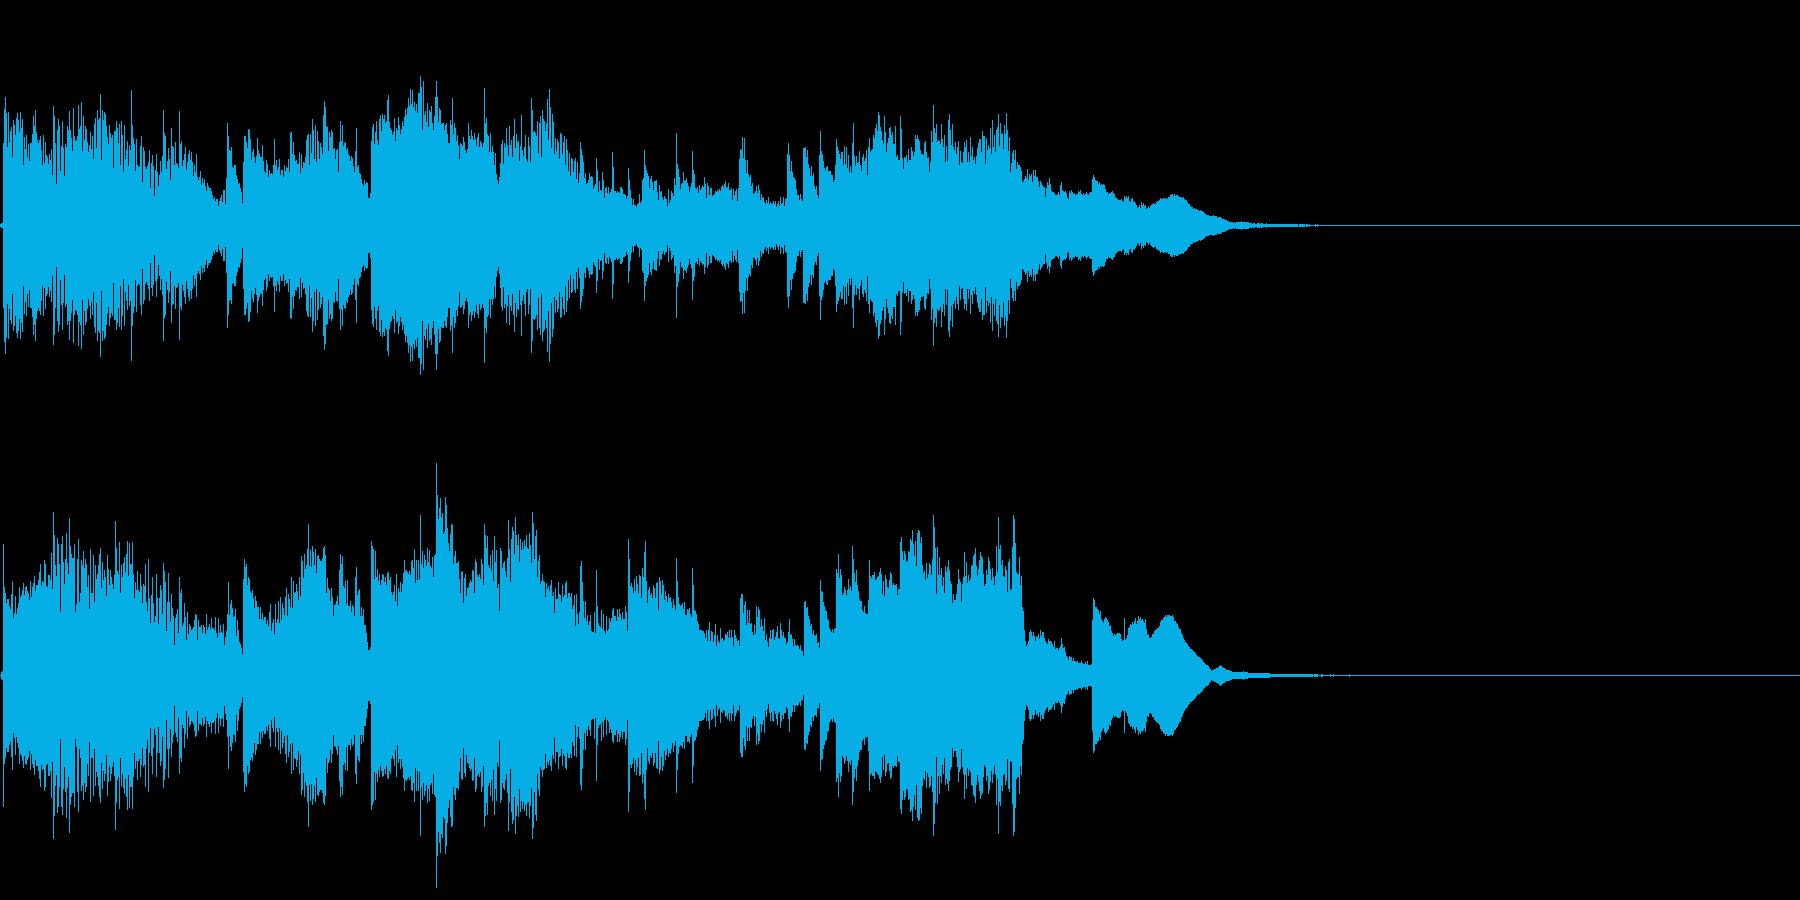 blue songの再生済みの波形